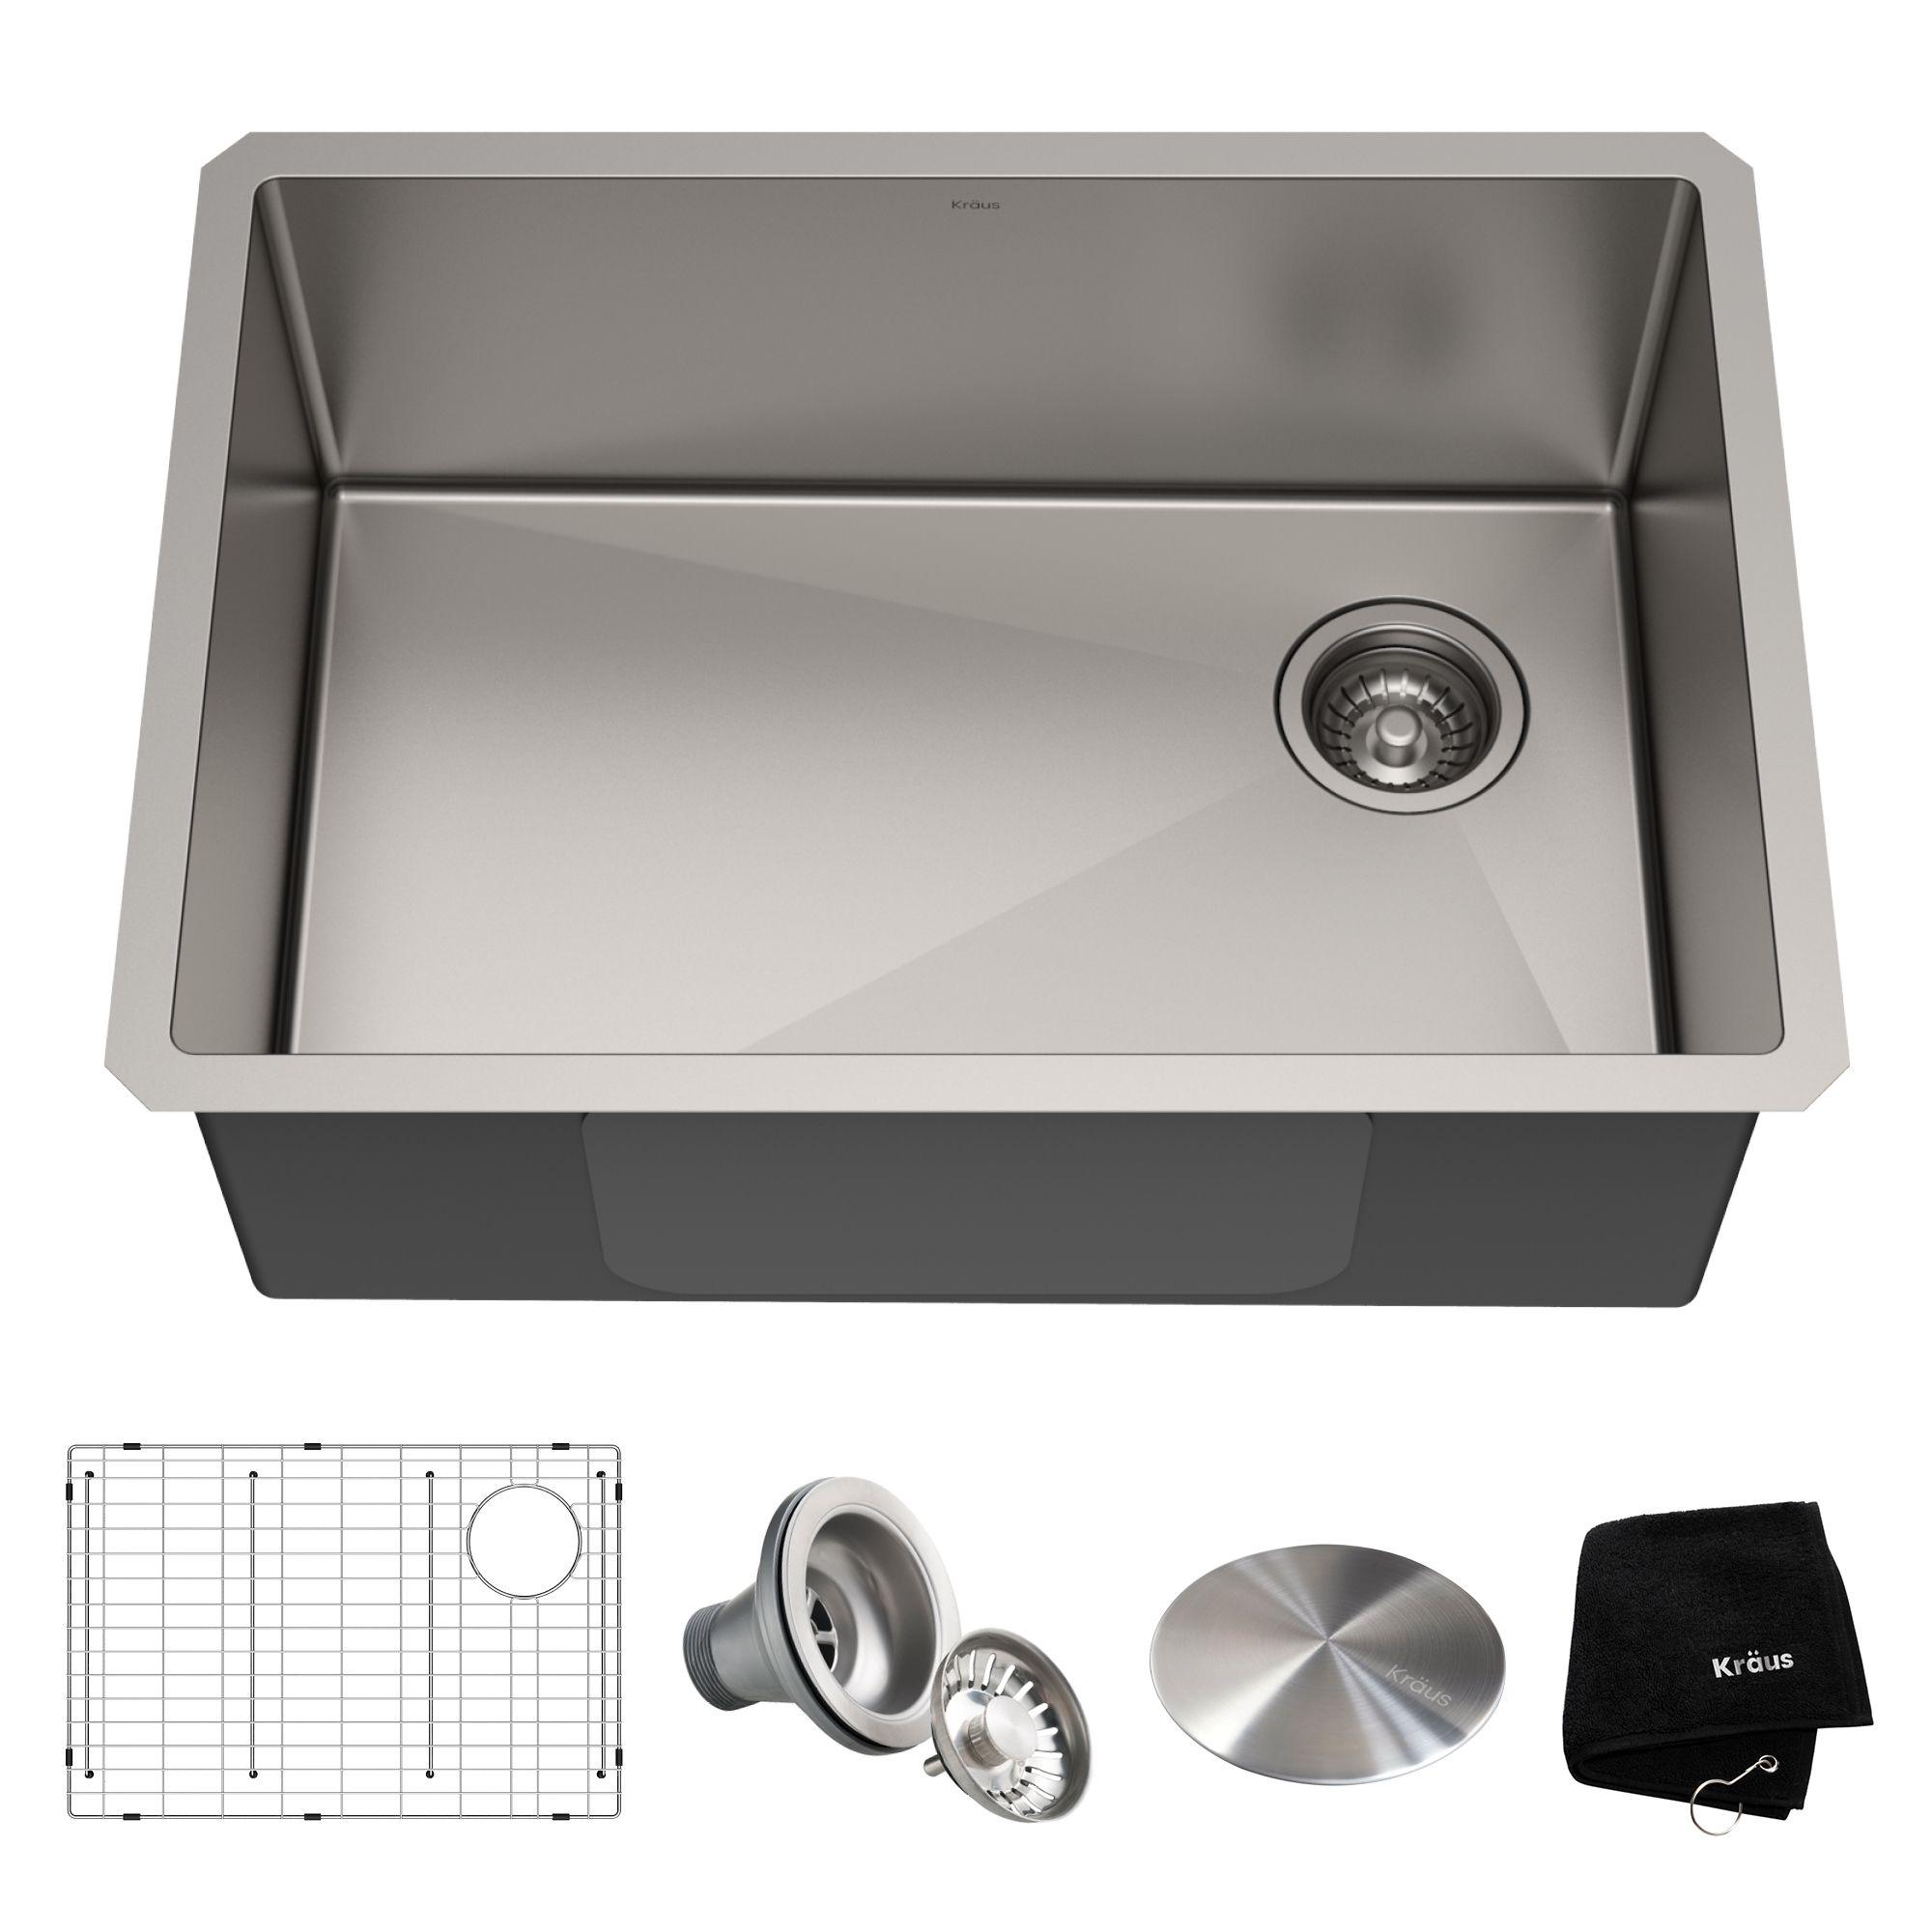 27 Undermount 16 Gauge Stainless Steel Single Bowl Kitchen Sink In 2020 Single Bowl Kitchen Sink Stainless Steel Kitchen Sink